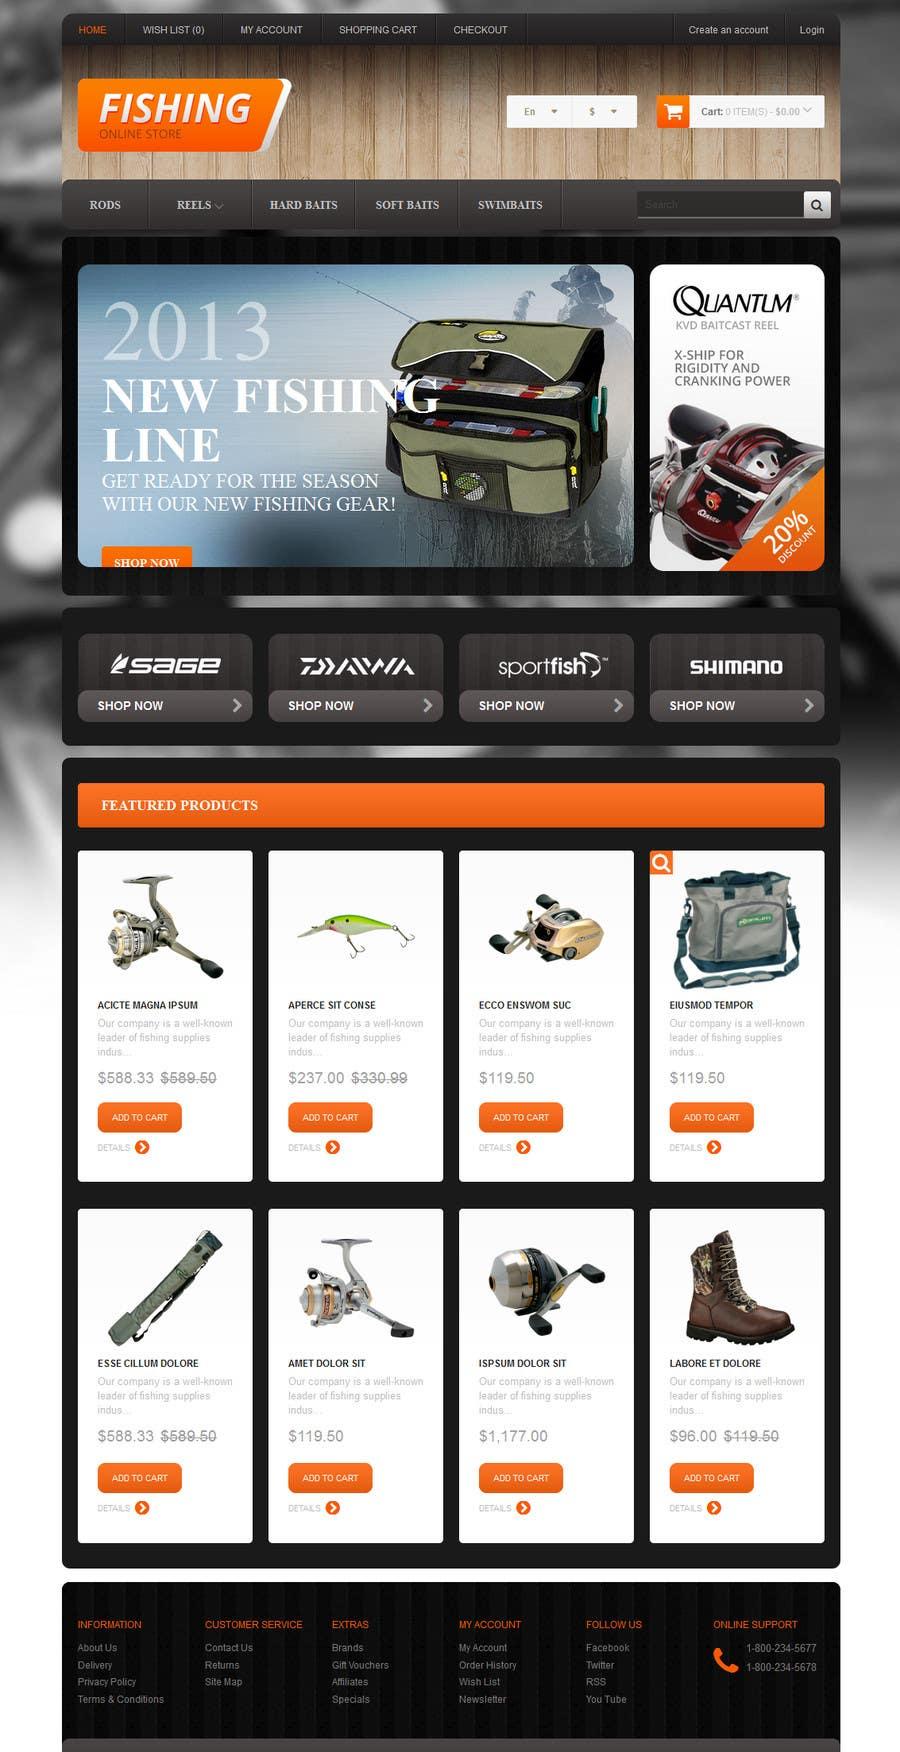 Inscrição nº 2 do Concurso para Build an Online Store for Spare Parts used in agriculture